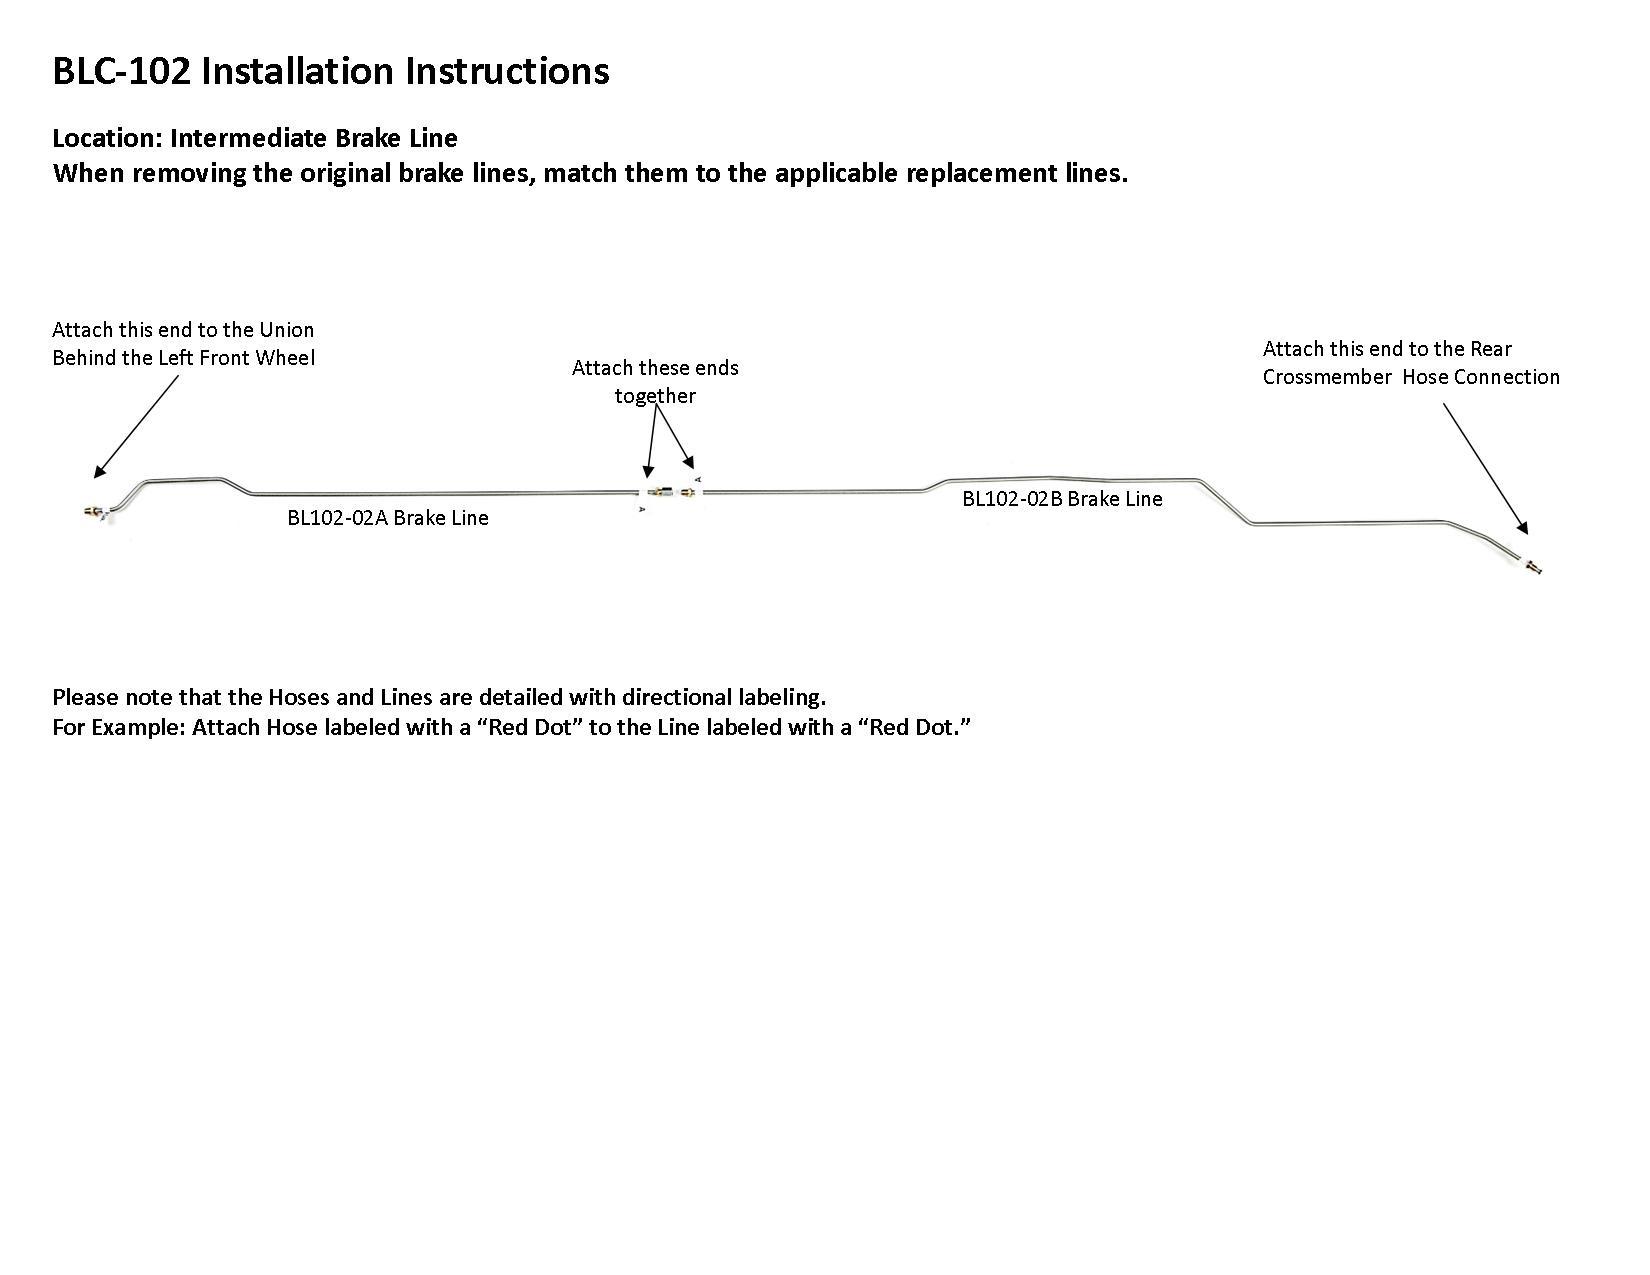 95-99-chevrolet-gmc-suburban-brake-line-installation-instruction-blc-102.jpg